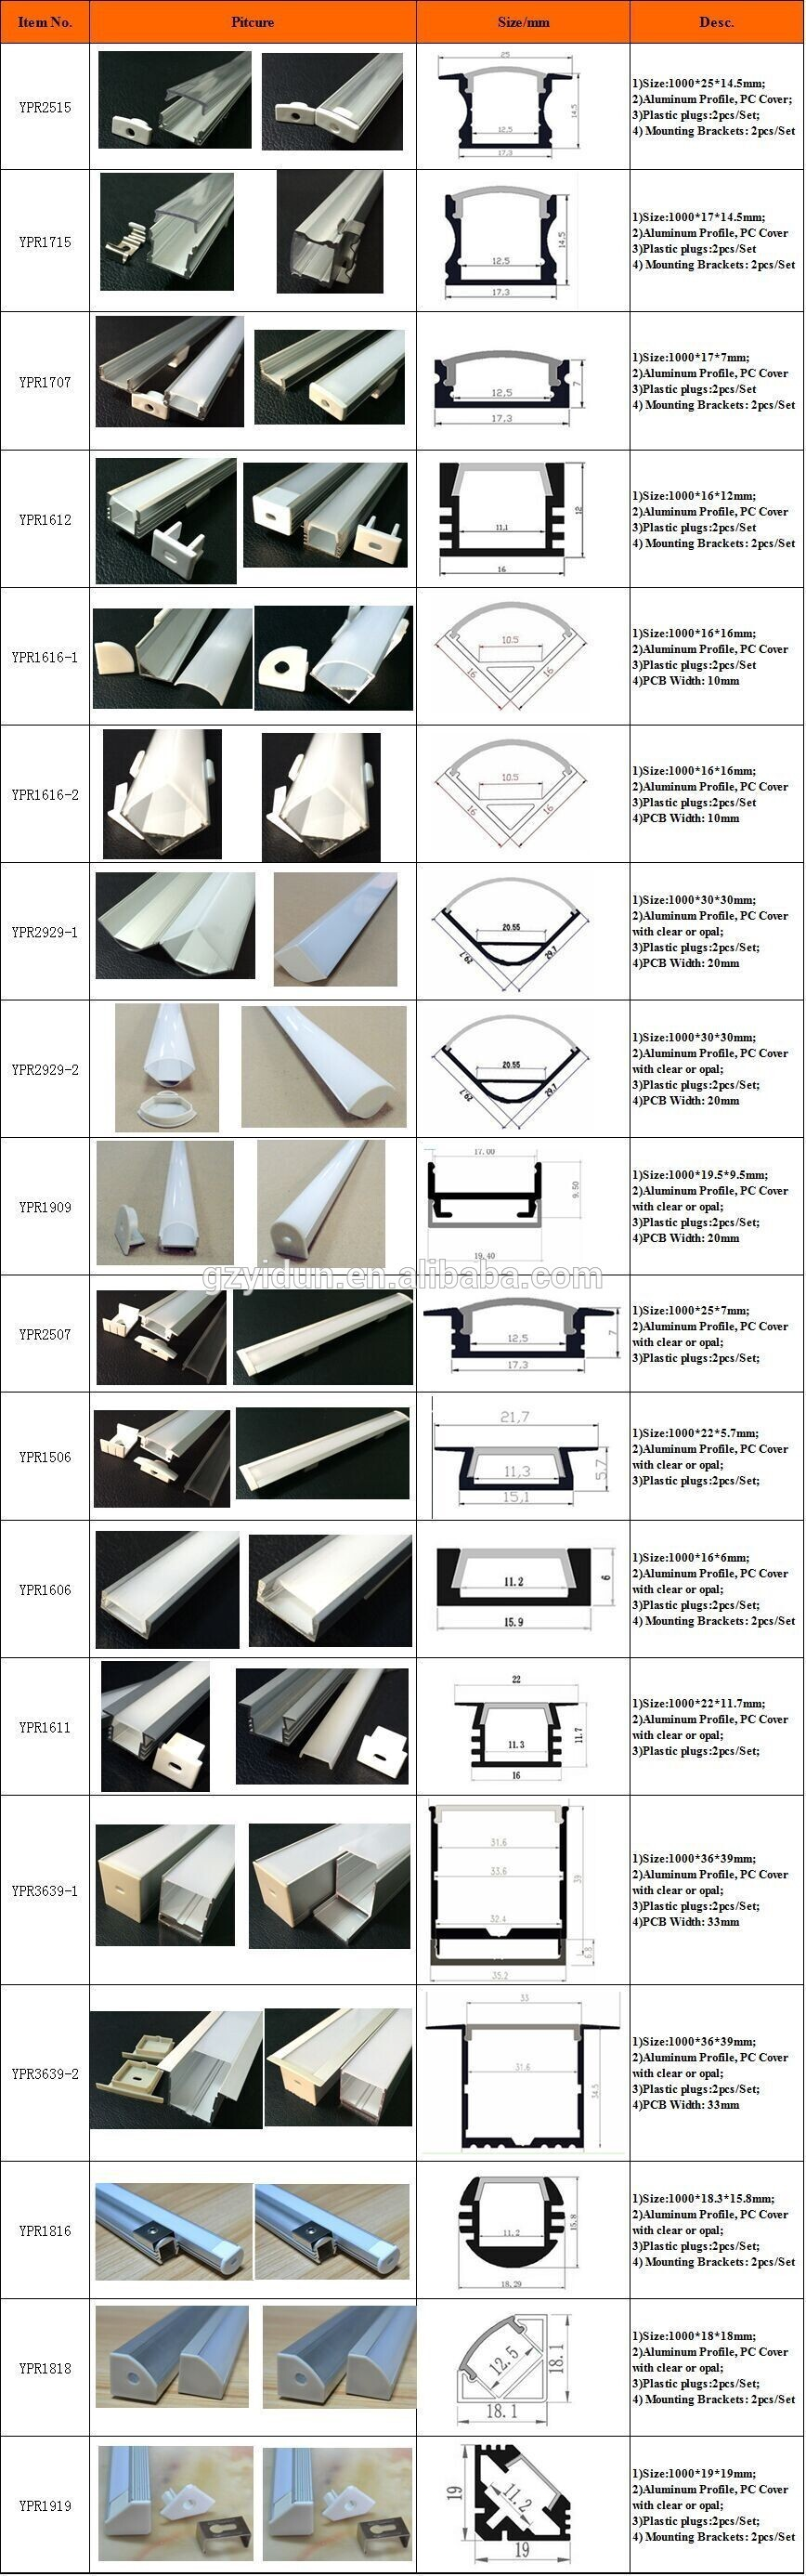 HTB1B_jsKXXXXXbsXFXXq6xXFXXXR Fabelhafte Led Flex Lichtleisten Set Dekorationen